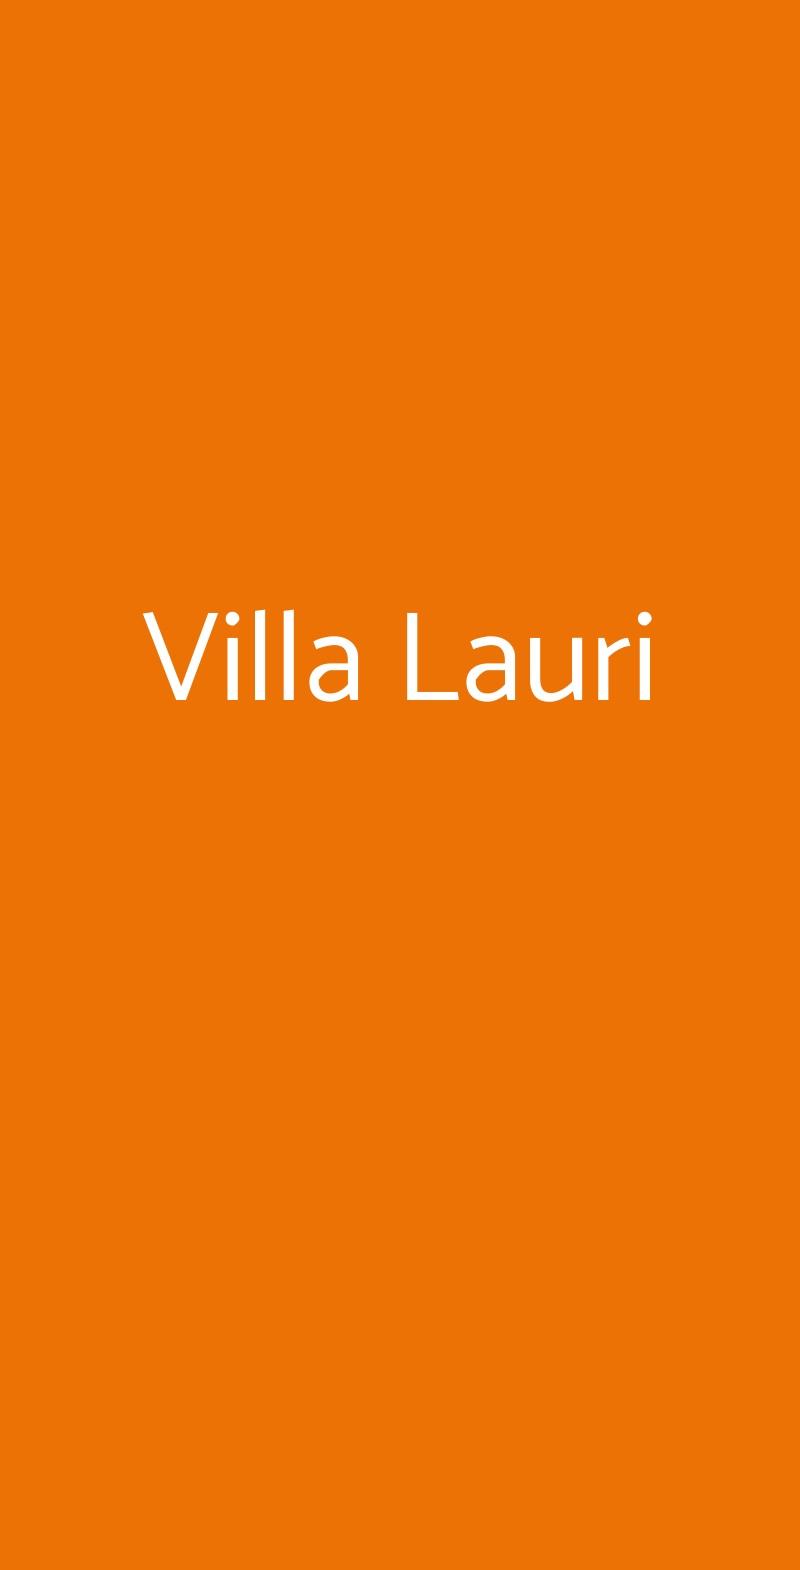 Villa Lauri Palma Campania menù 1 pagina